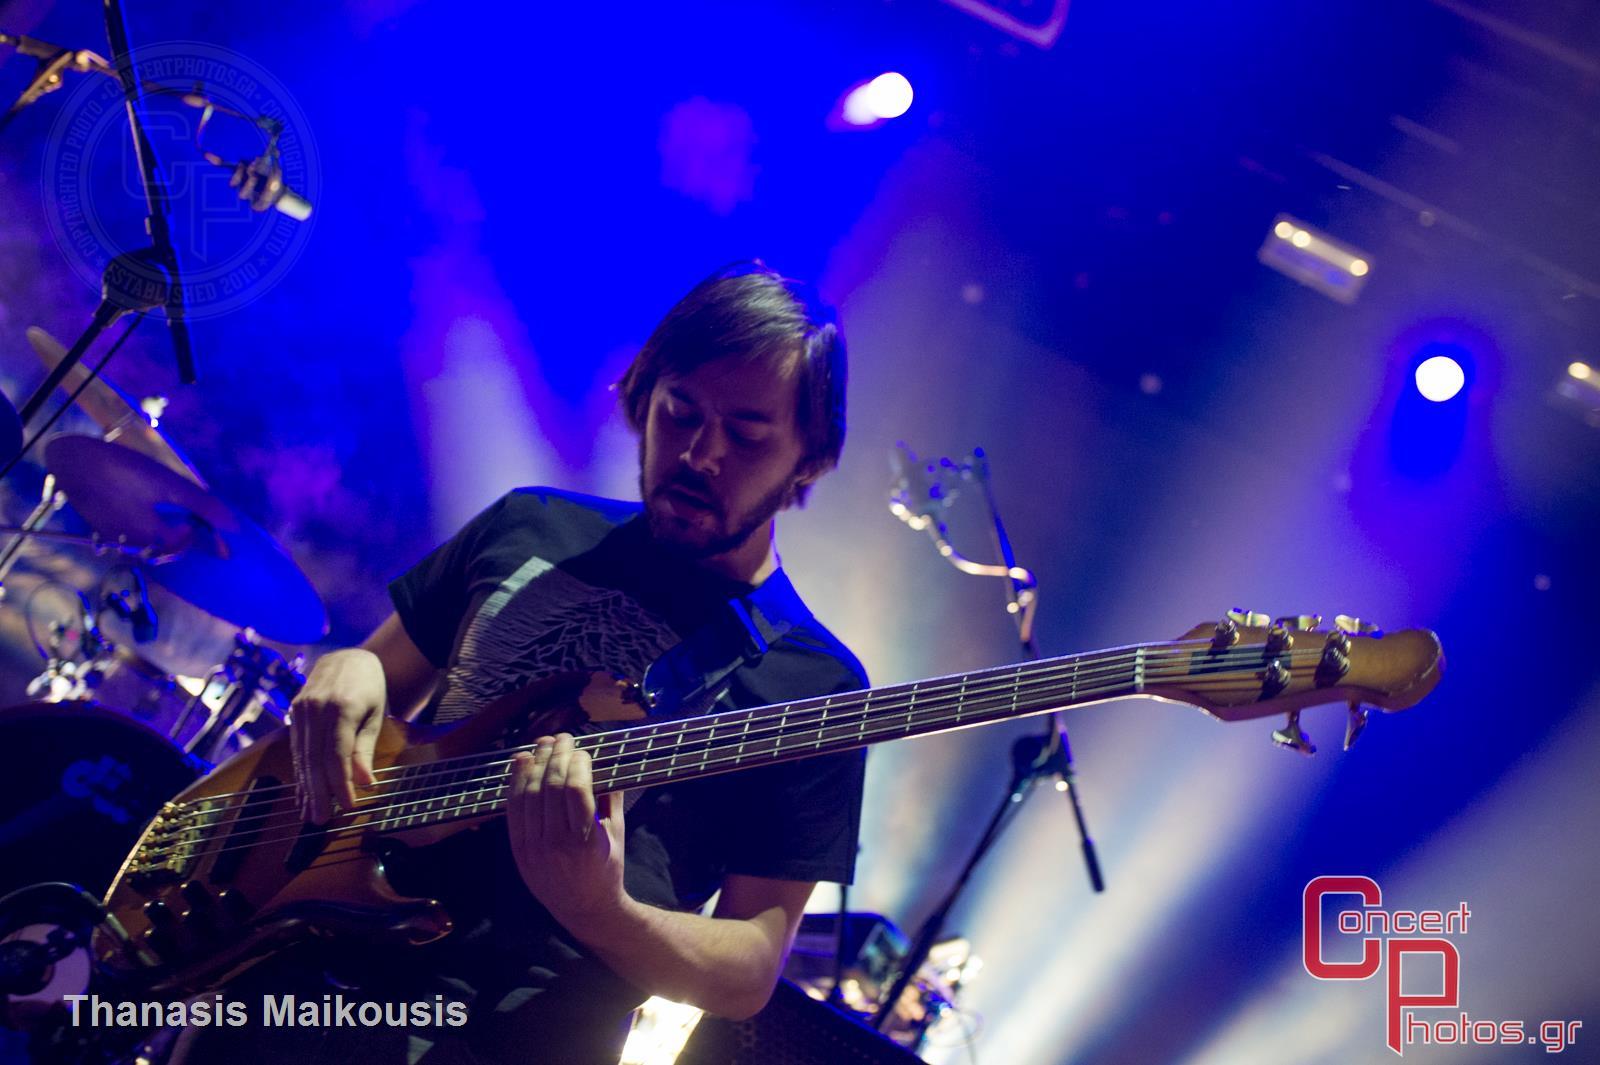 Tricky - Spectralfire-Tricky - Spectralfire photographer: Thanasis Maikousis - concertphotos_-3415